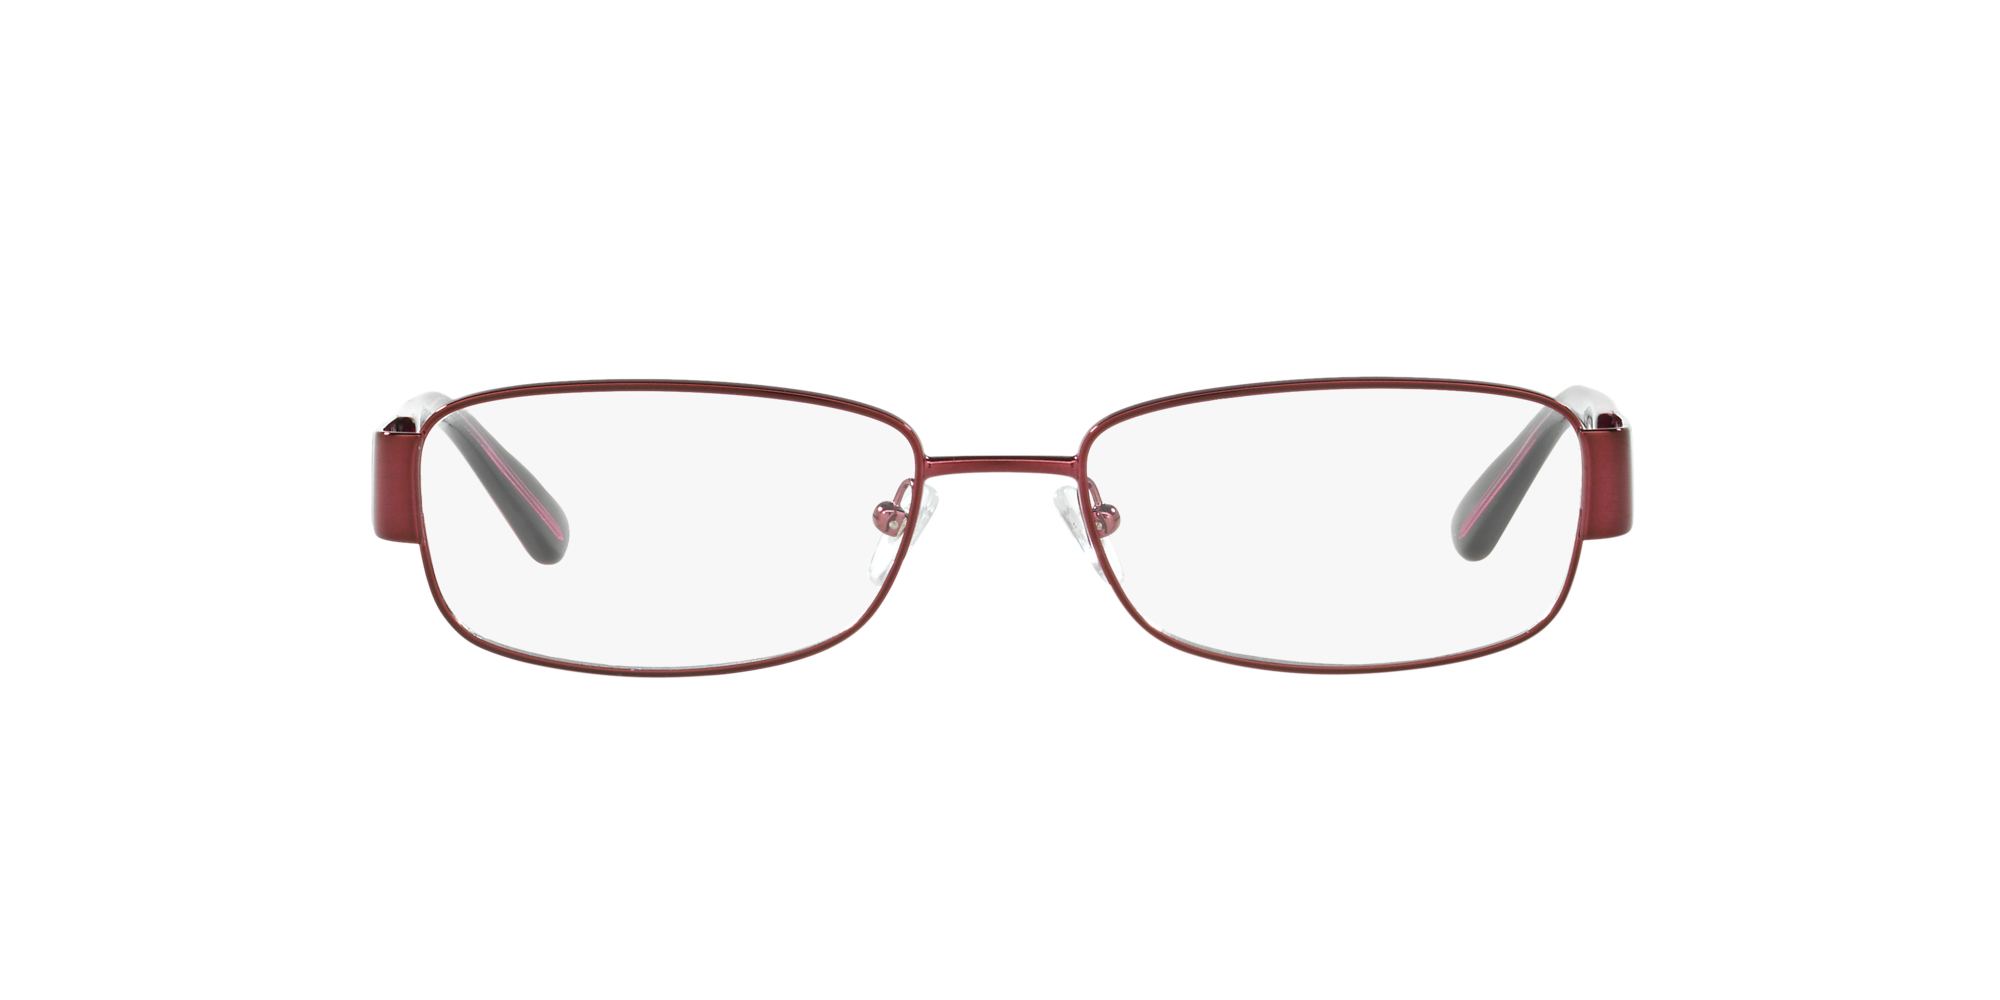 Image for VO3892I from LensCrafters | Glasses, Prescription Glasses Online, Eyewear